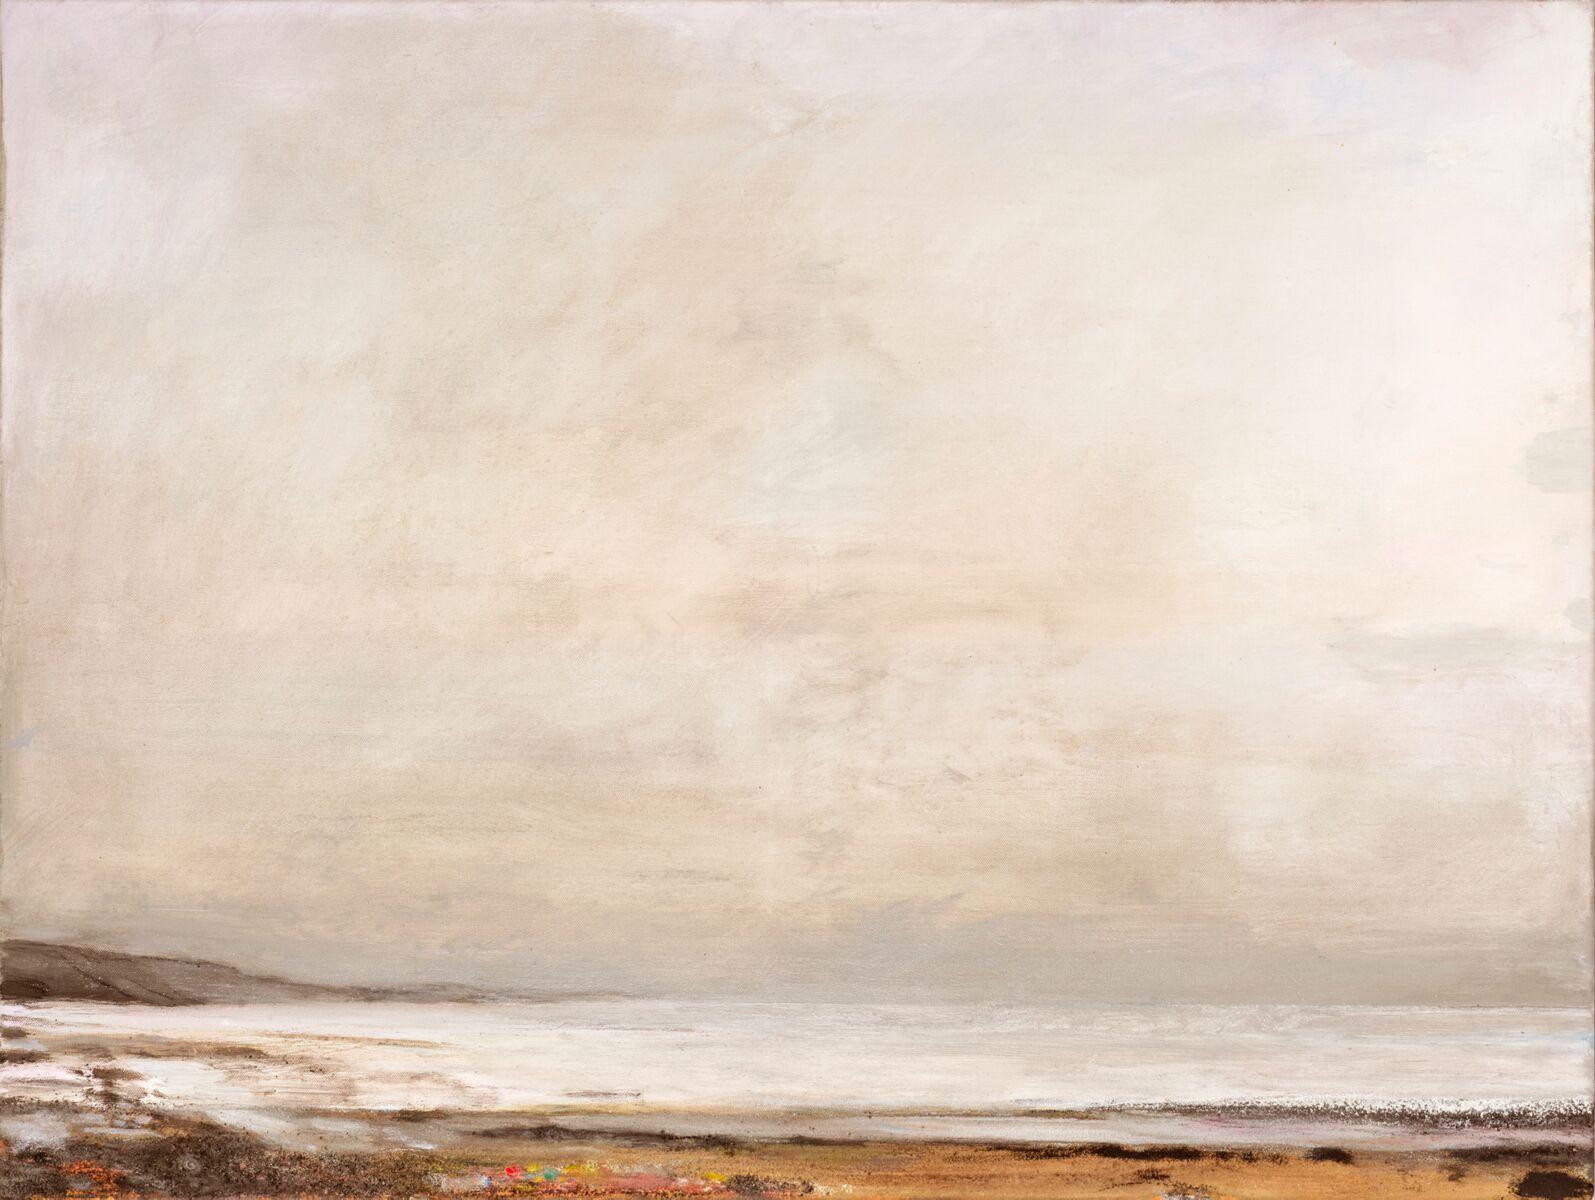 39 Winter Sea, 70x100cm, oil on linen